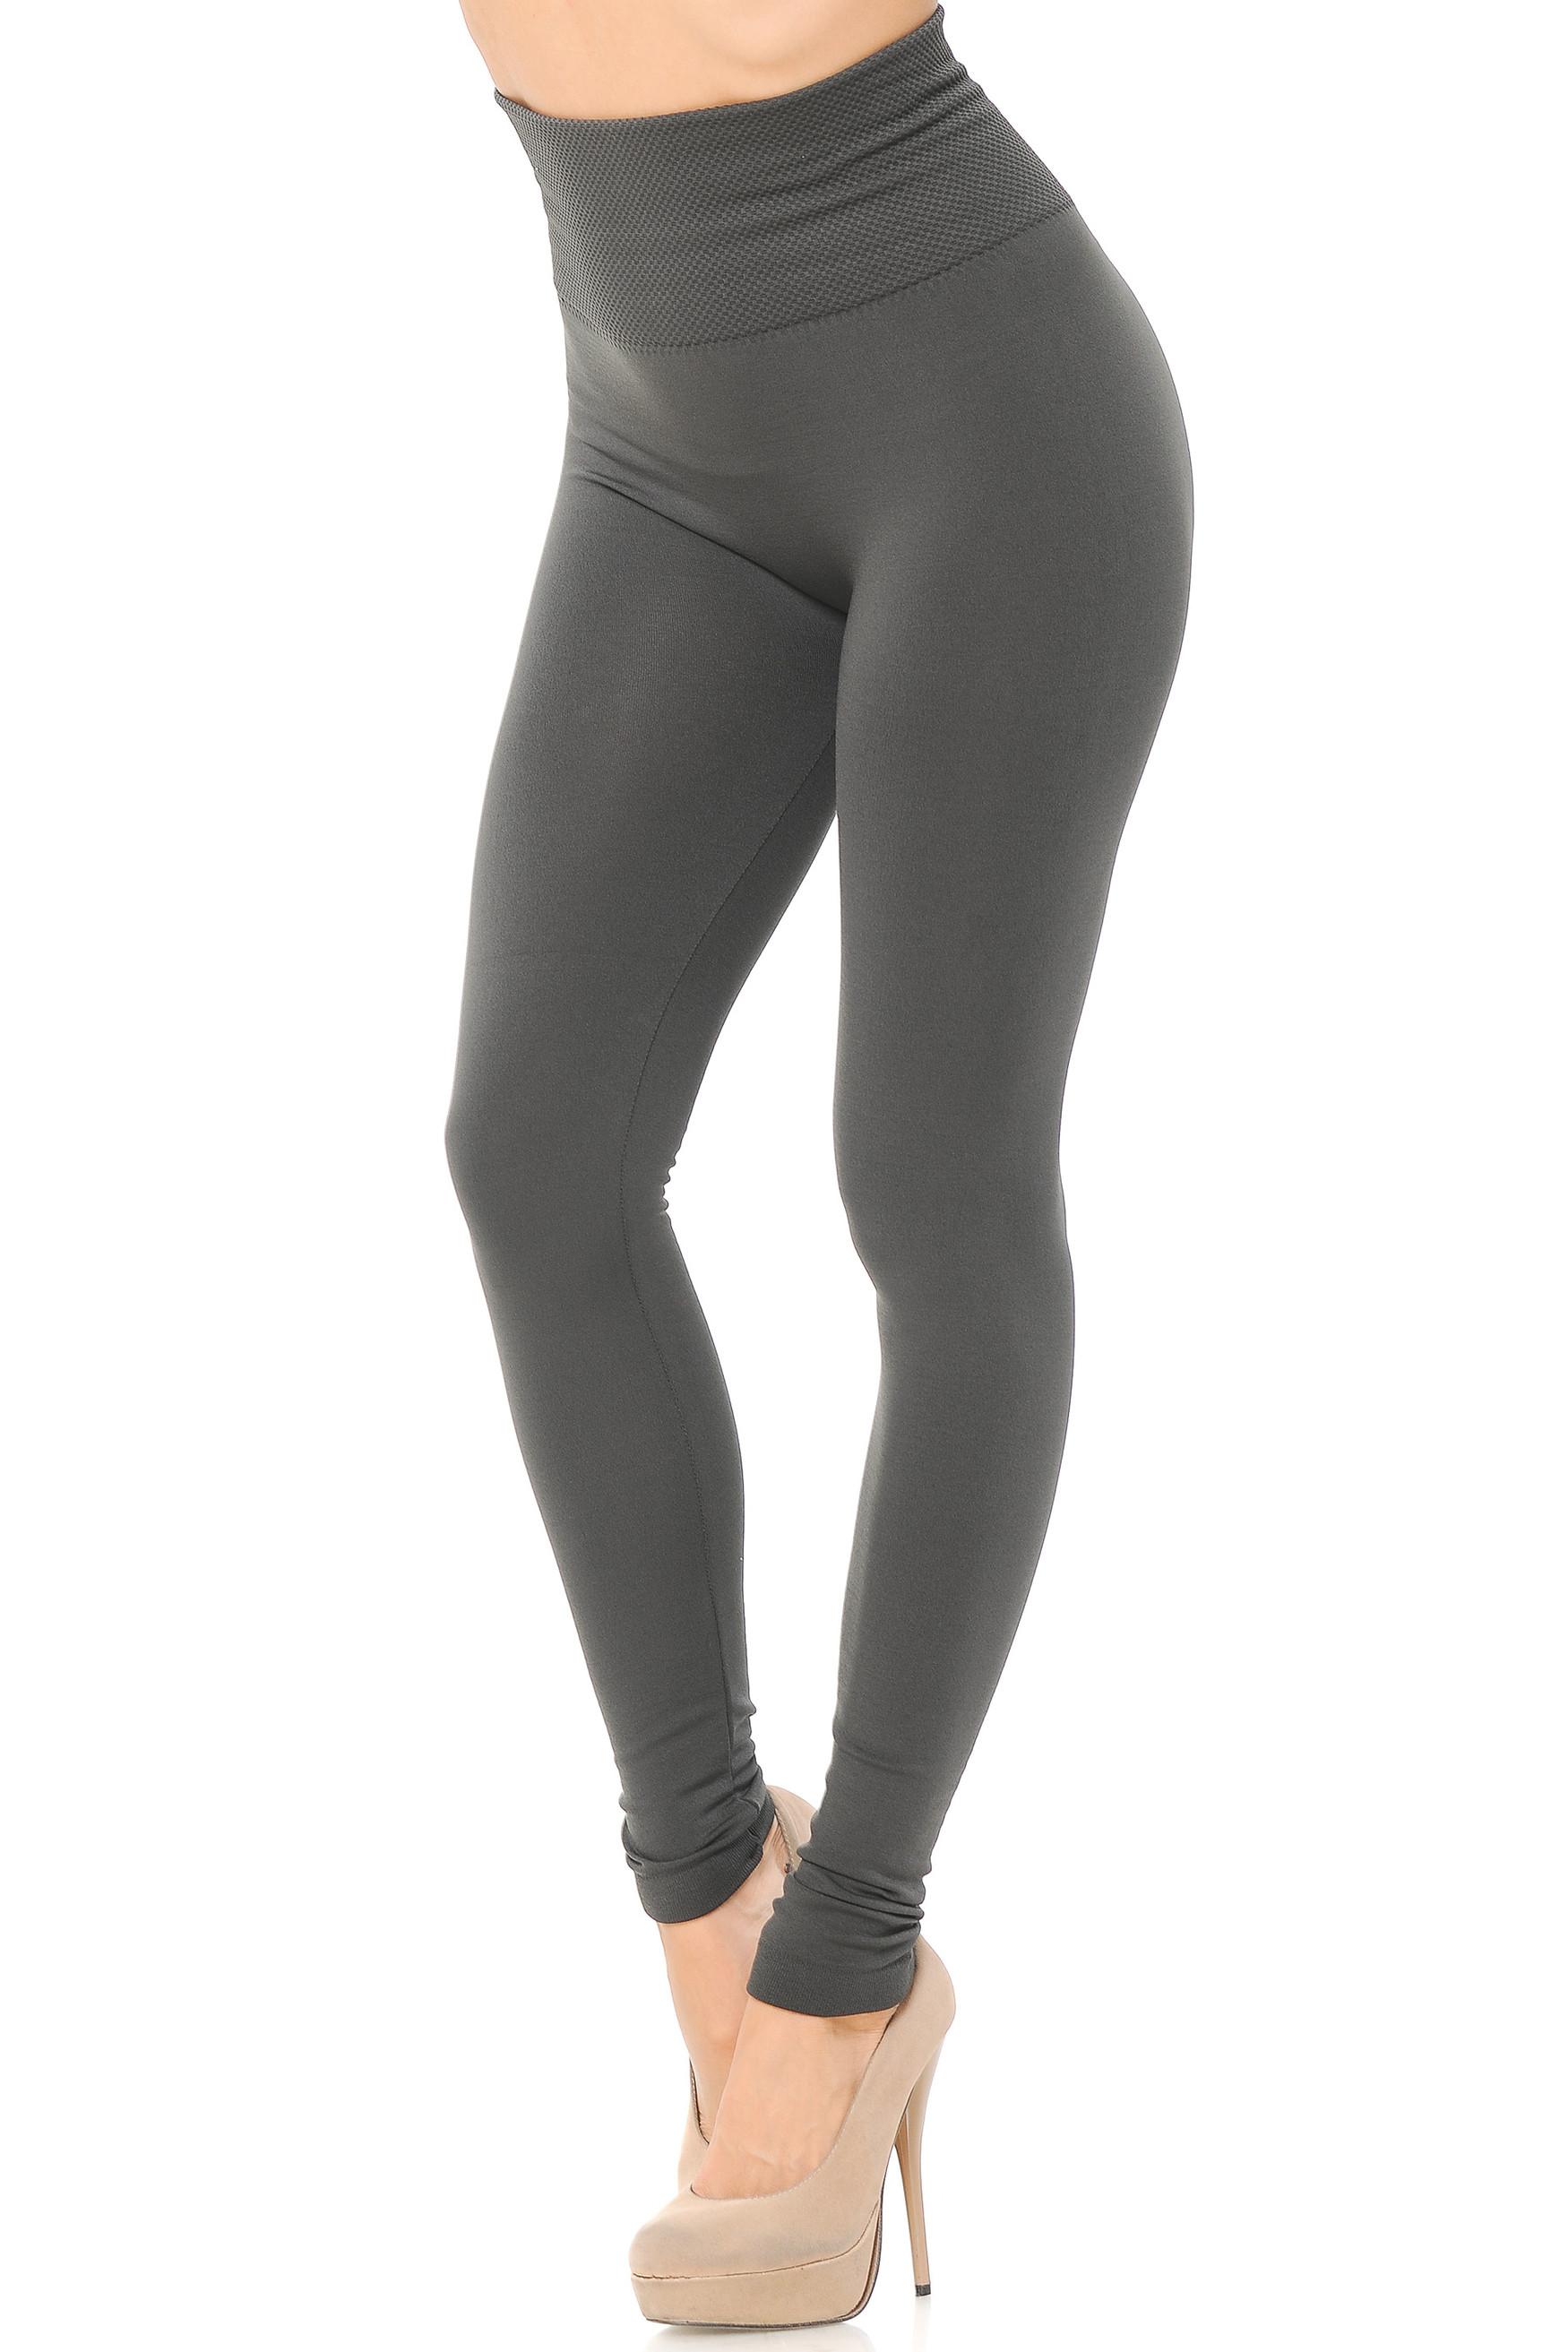 High Waisted Tummy Tuck Fleece Lined Leggings